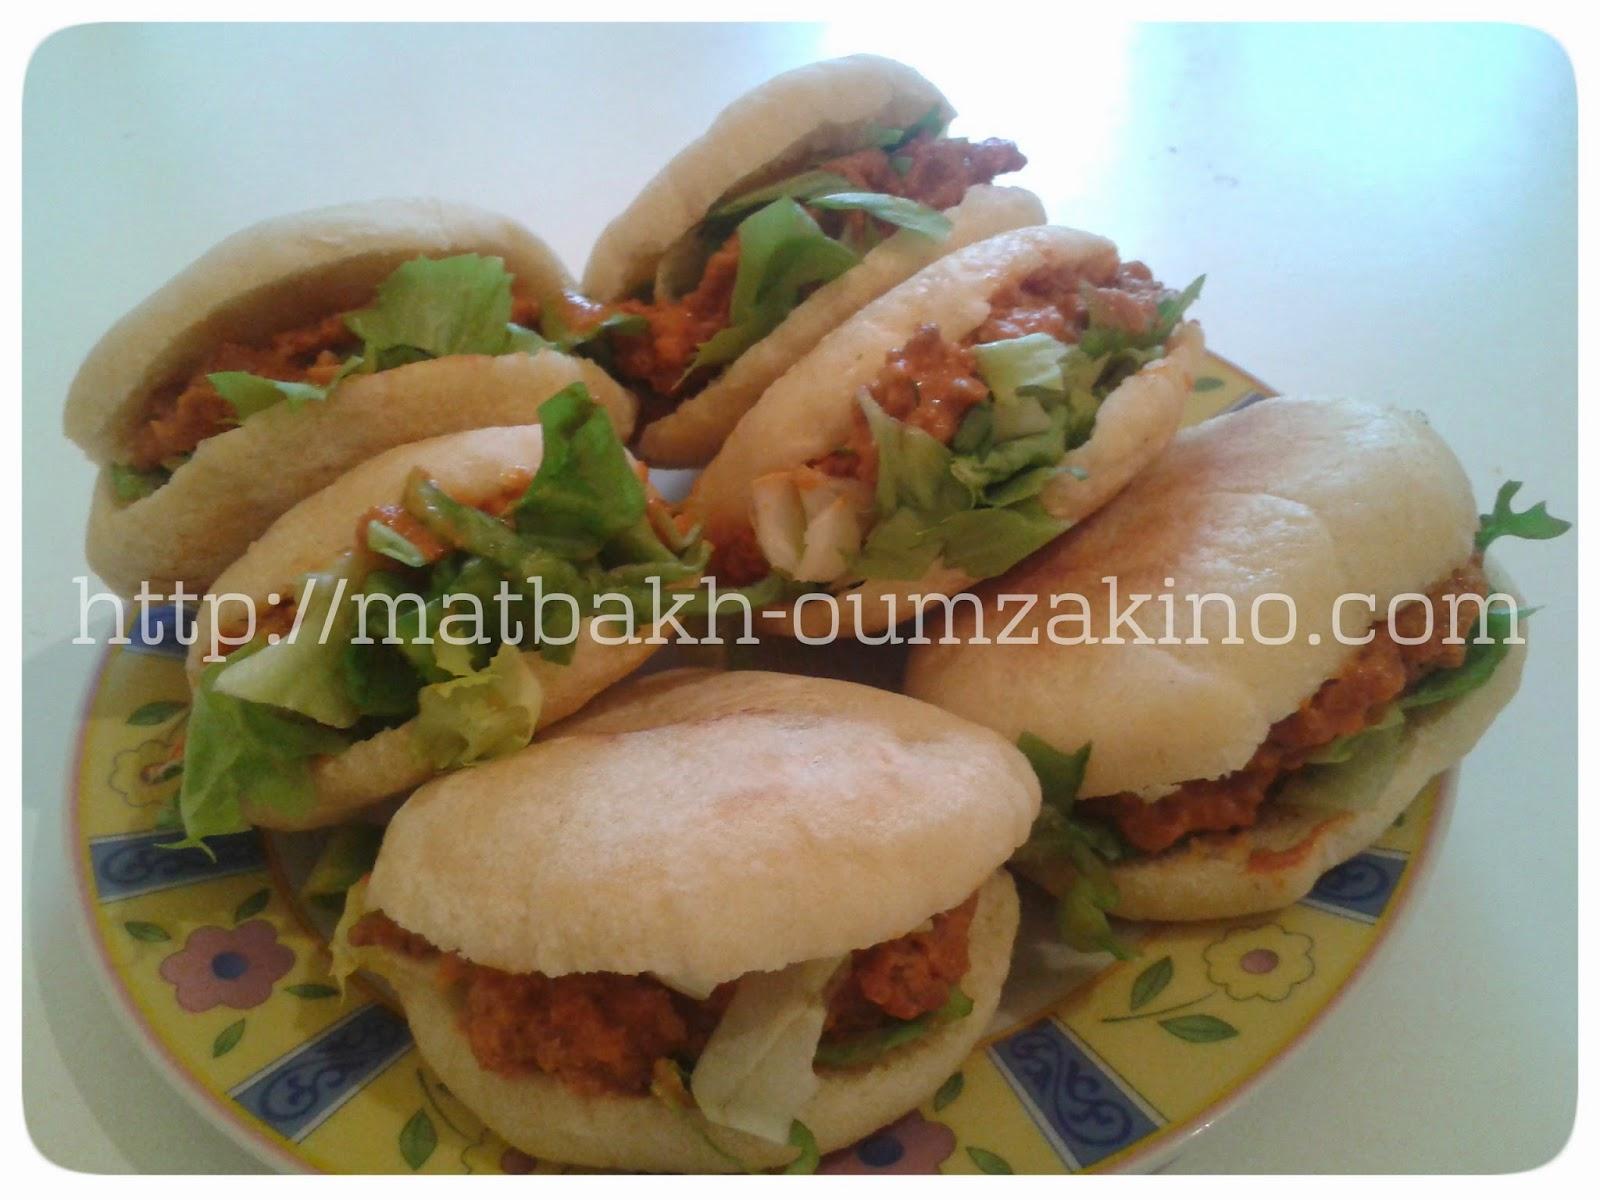 Mini batbout salade viande haché oignion à la creme matbakh-oumzakino